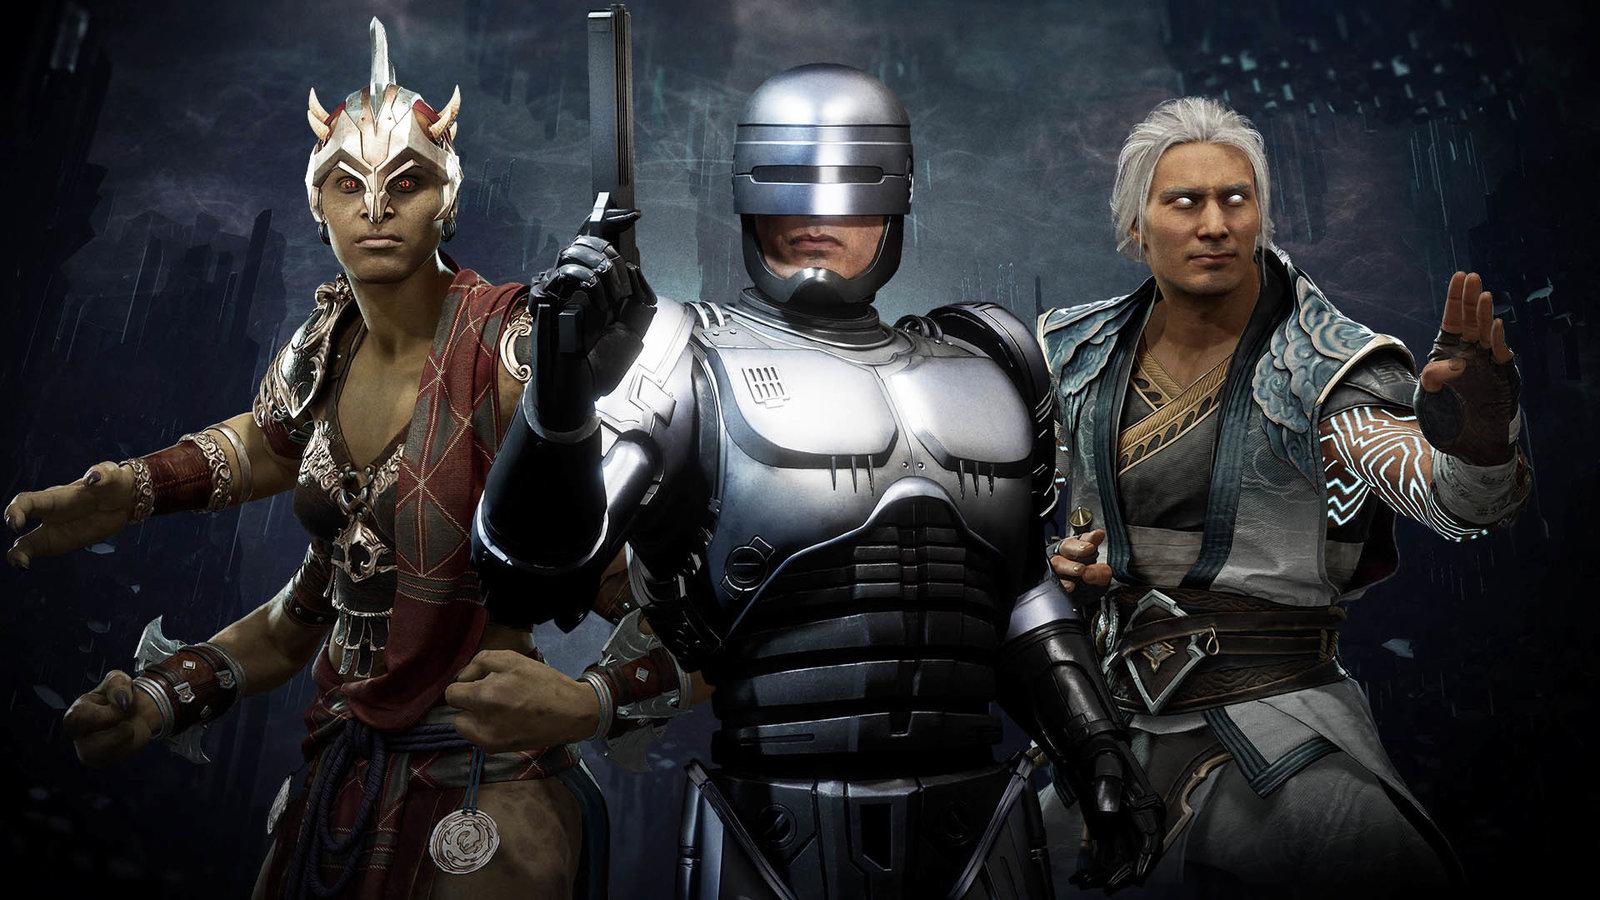 Mortal Kombat 11 Ultimate Edition image 1